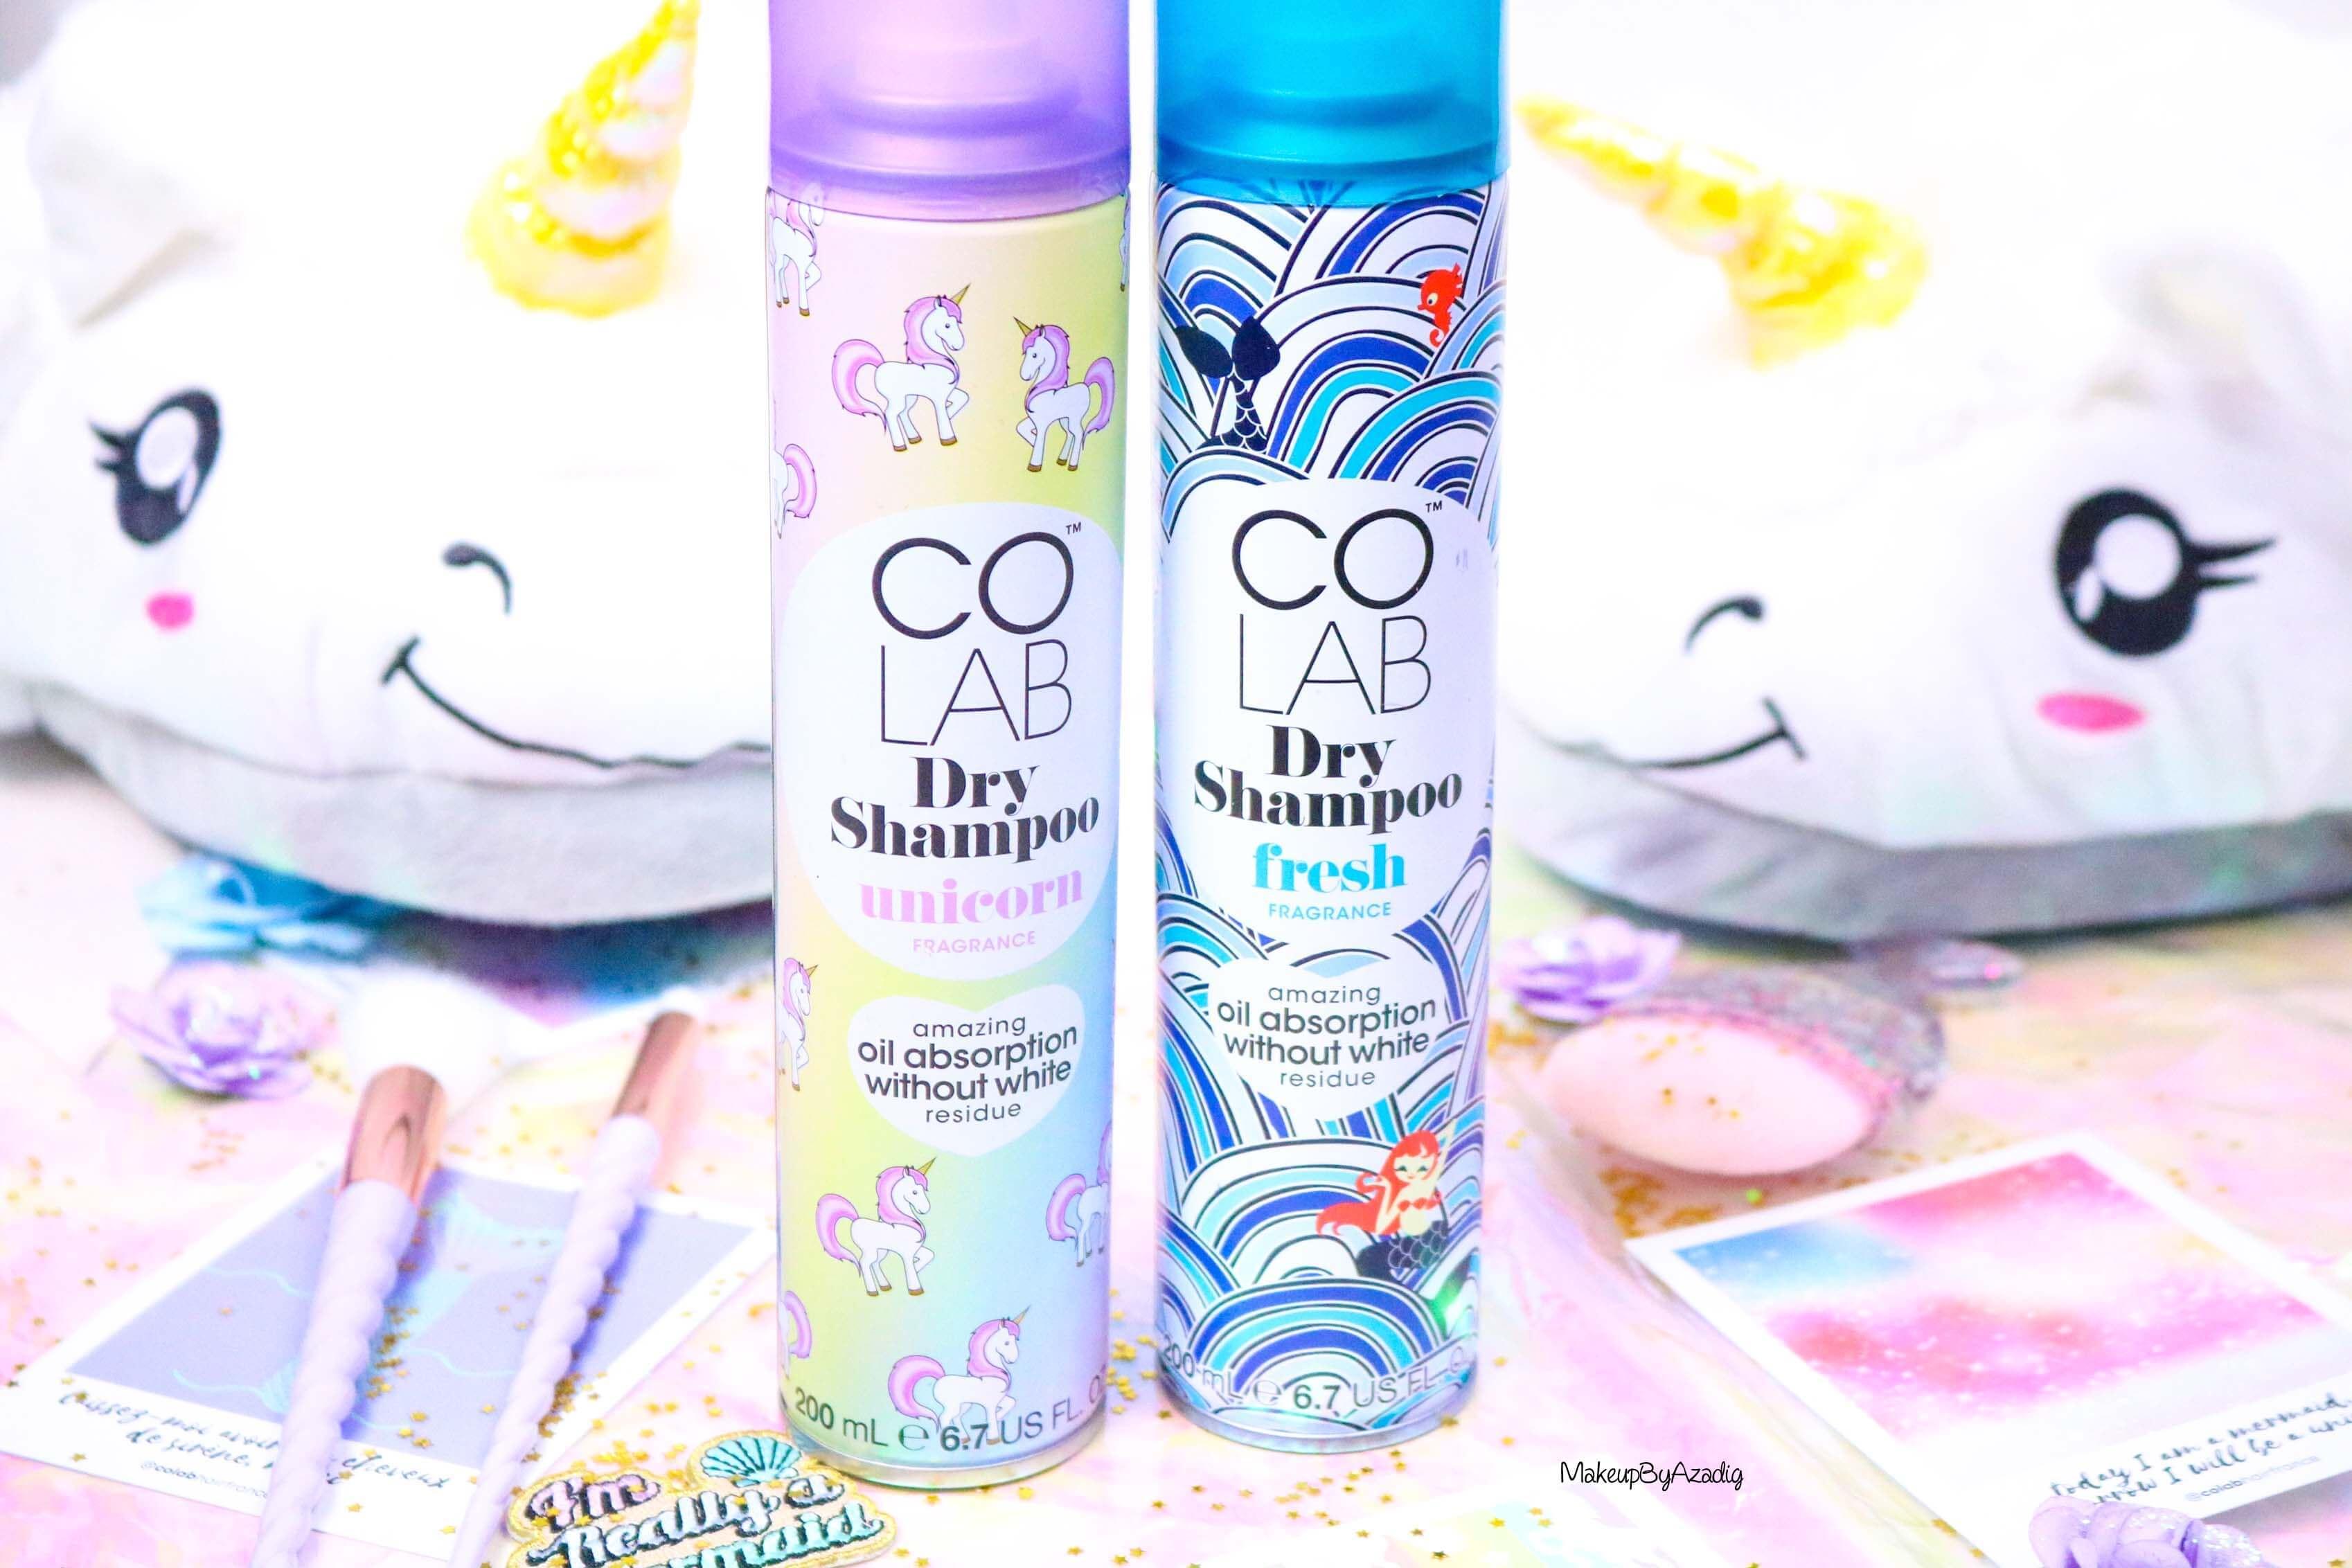 revue-shampooing-sec-colab-batiste-fresh-unicorn-monoprix-feelunique-prix-avis--soin-capillaire-efficacite-makeupbyazadig-miniature